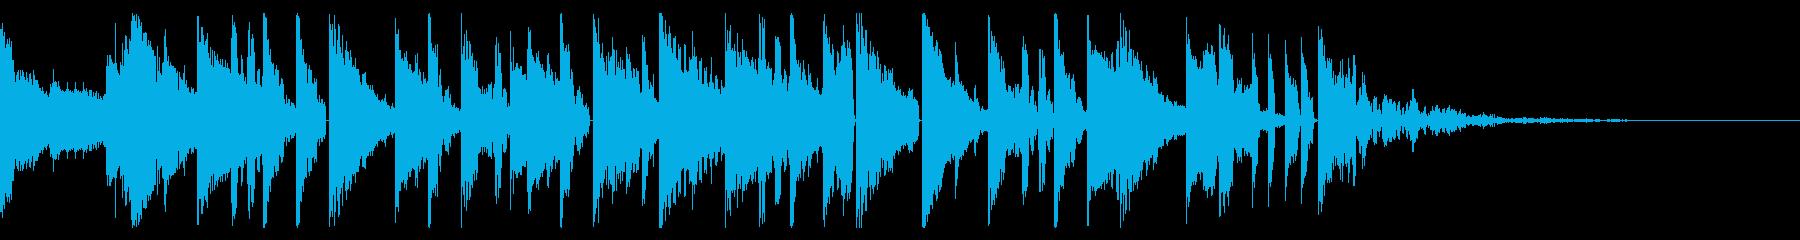 Tonal FX、160 BPMの再生済みの波形